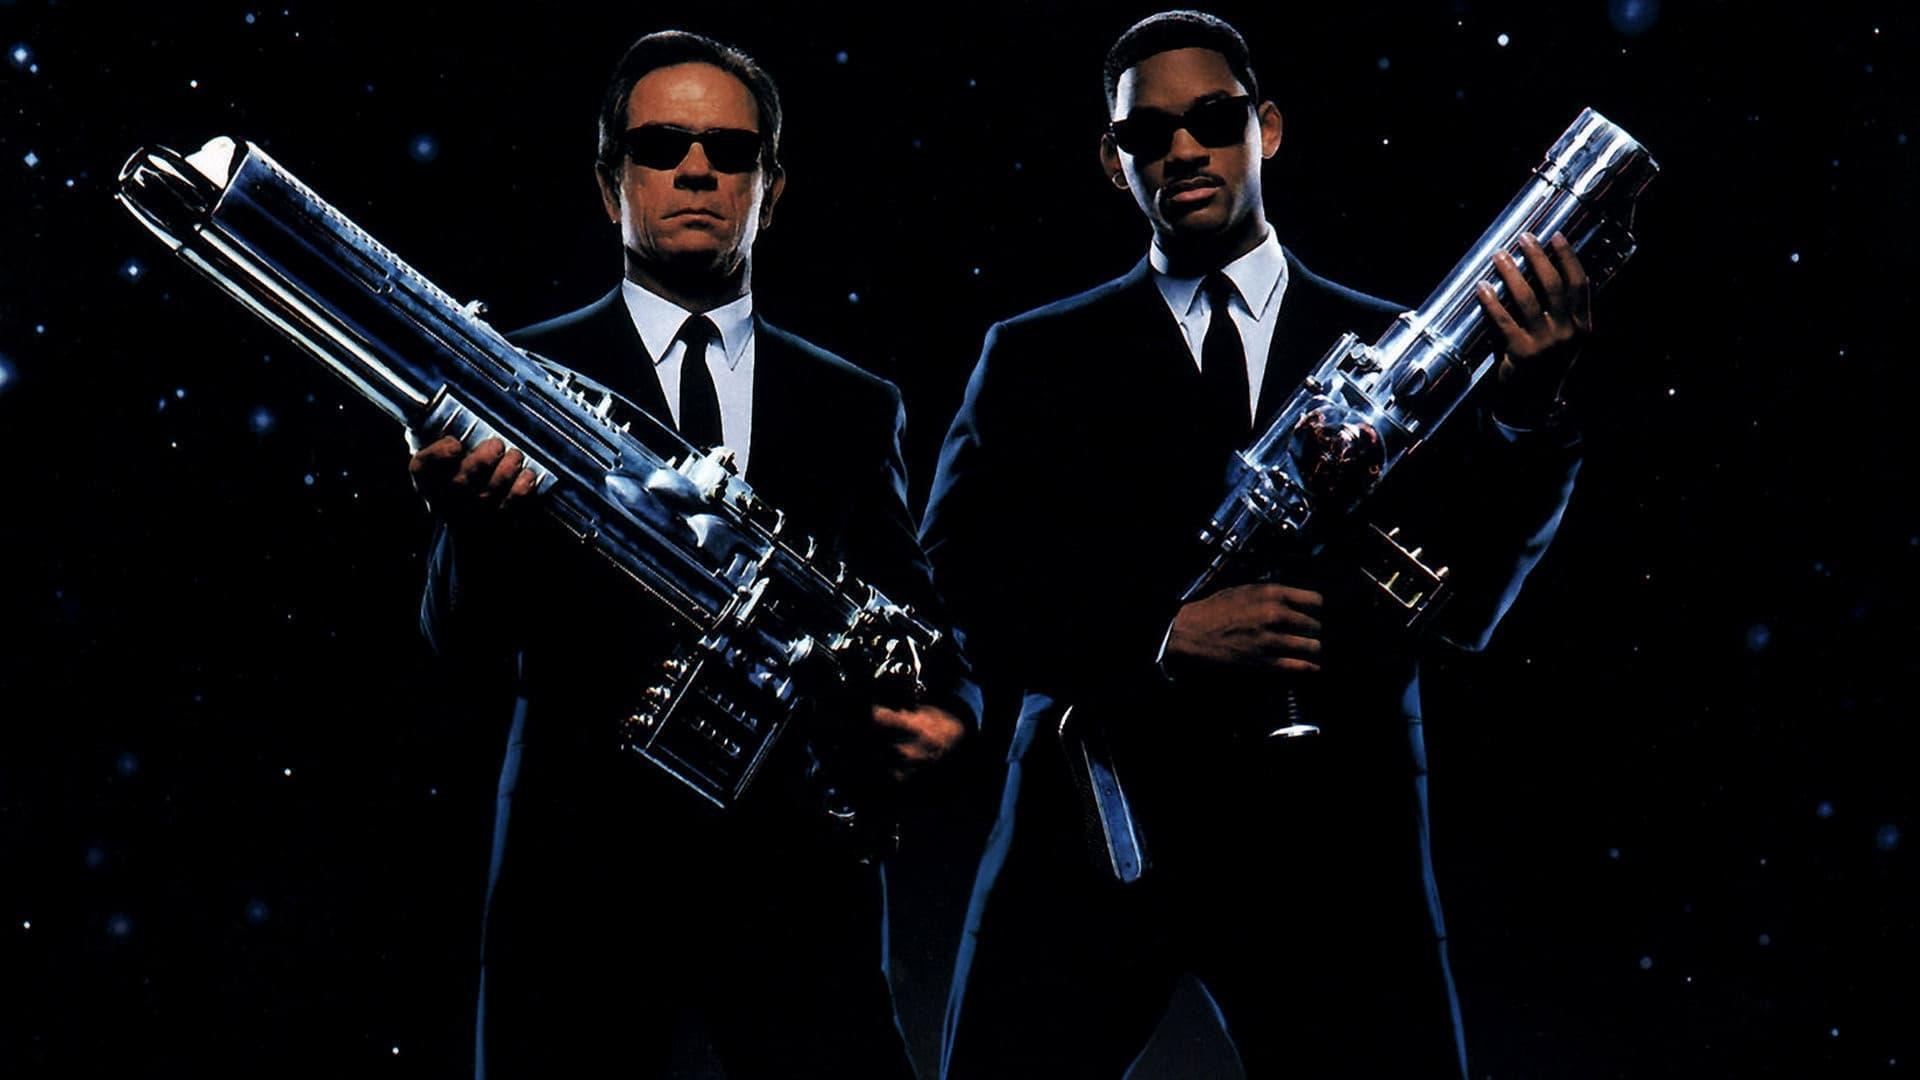 Contraportada Men in Black 3